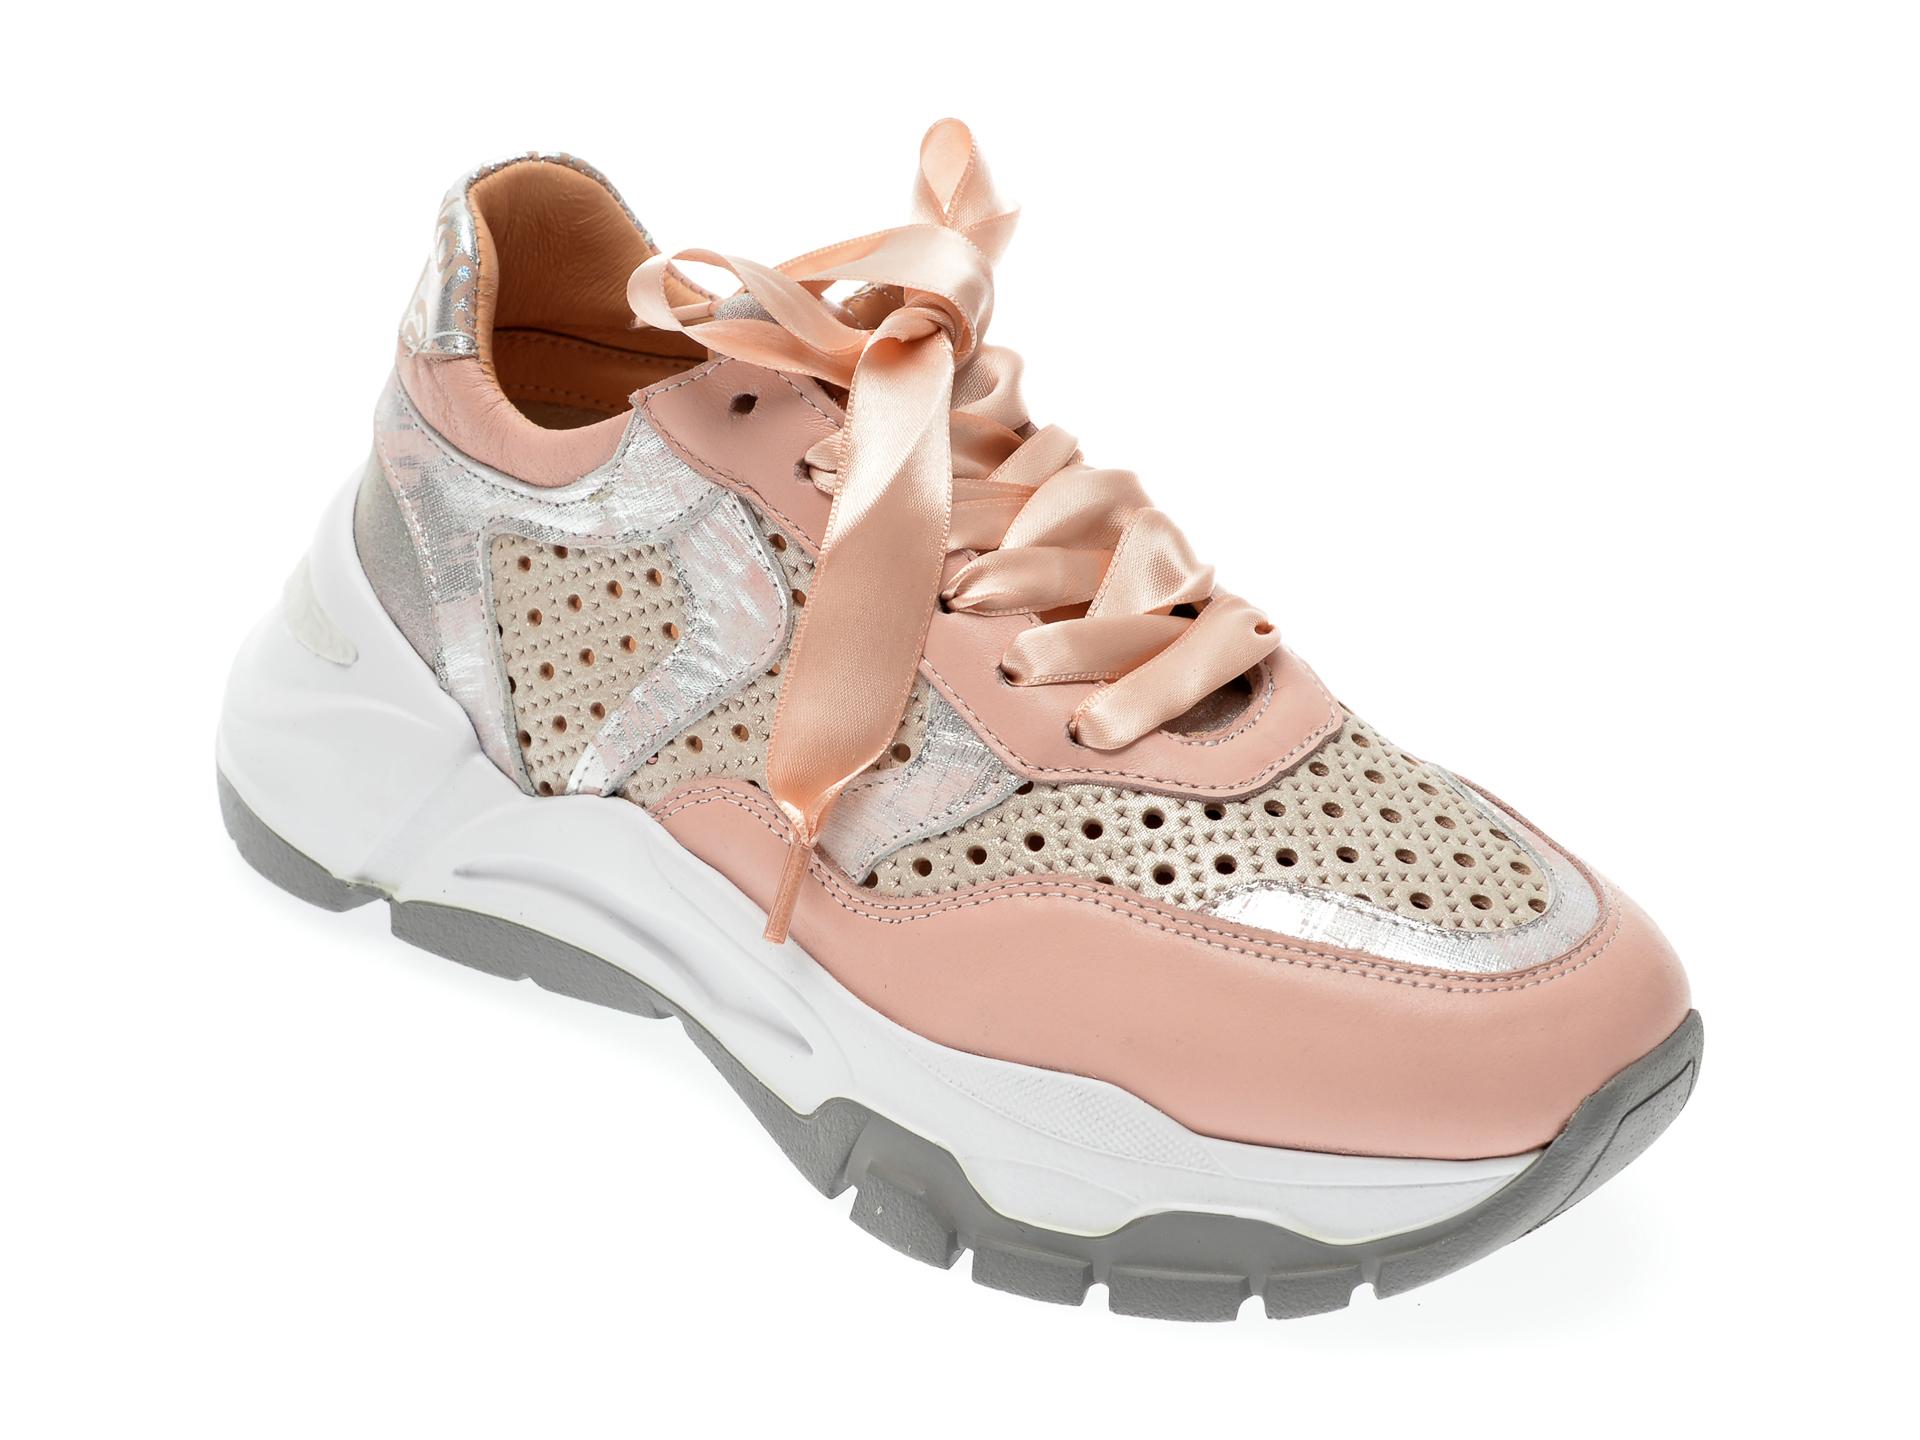 Pantofi sport EPICA roz, 135P245, din piele naturala imagine 2021 Epica